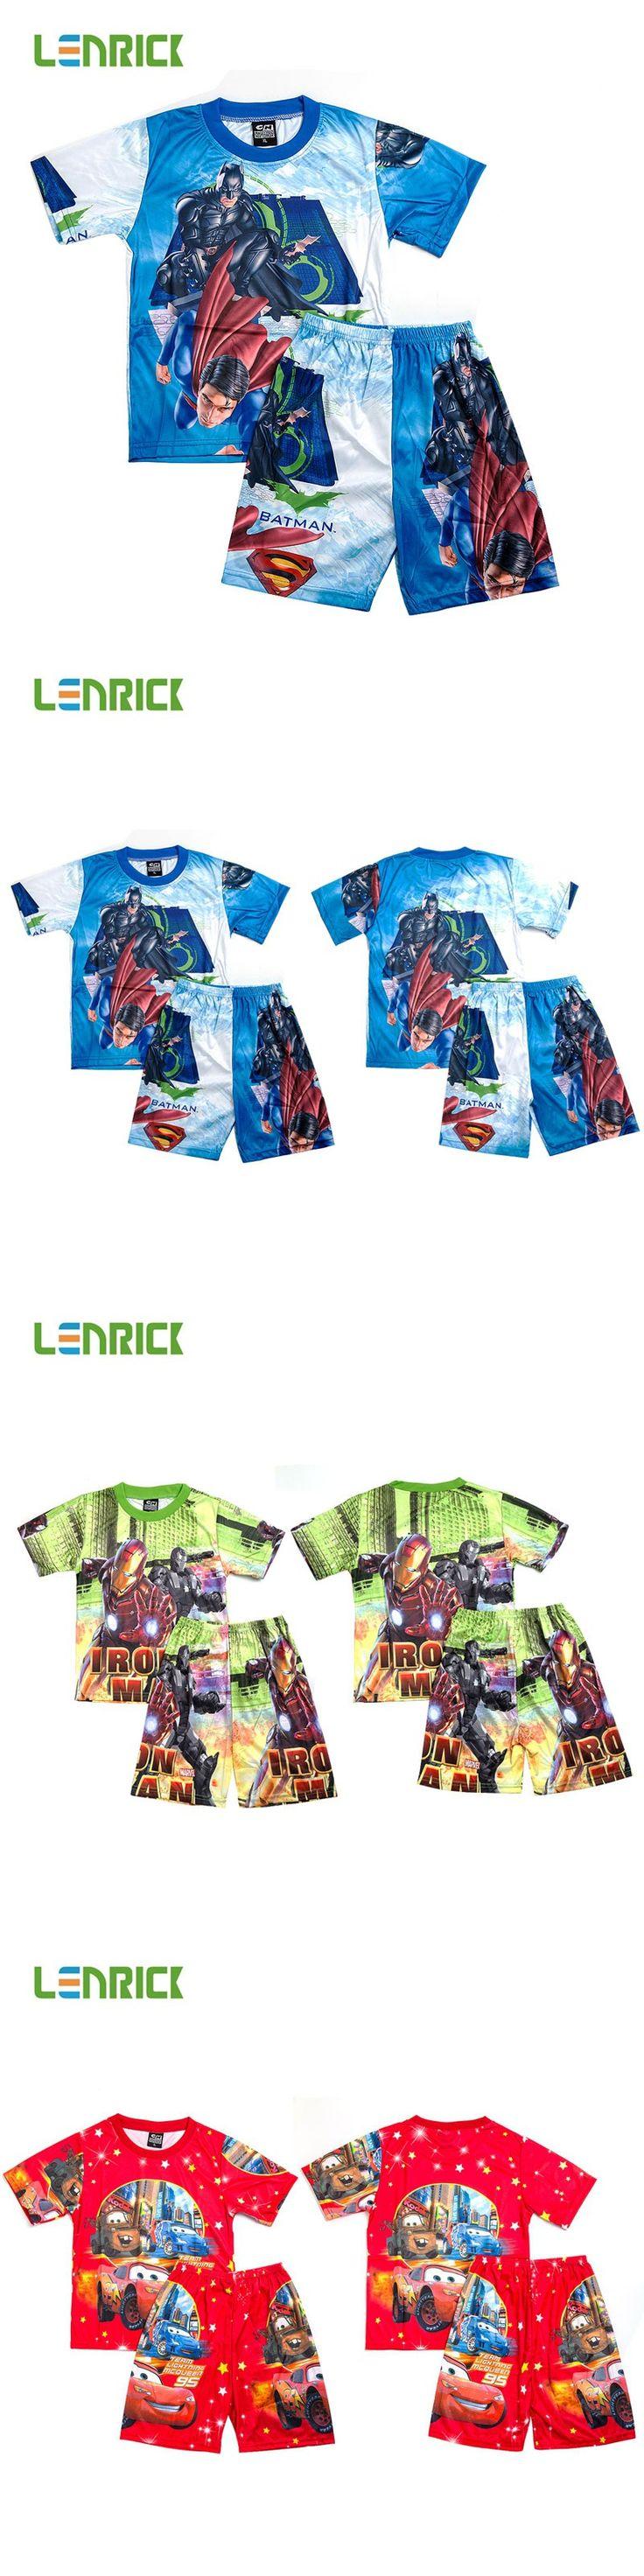 Lenrick 2016 Kids cartoon pajamas boys home sleepwear set Iron man casual nightwear childrens clothes kids sleeping clothing $7.31